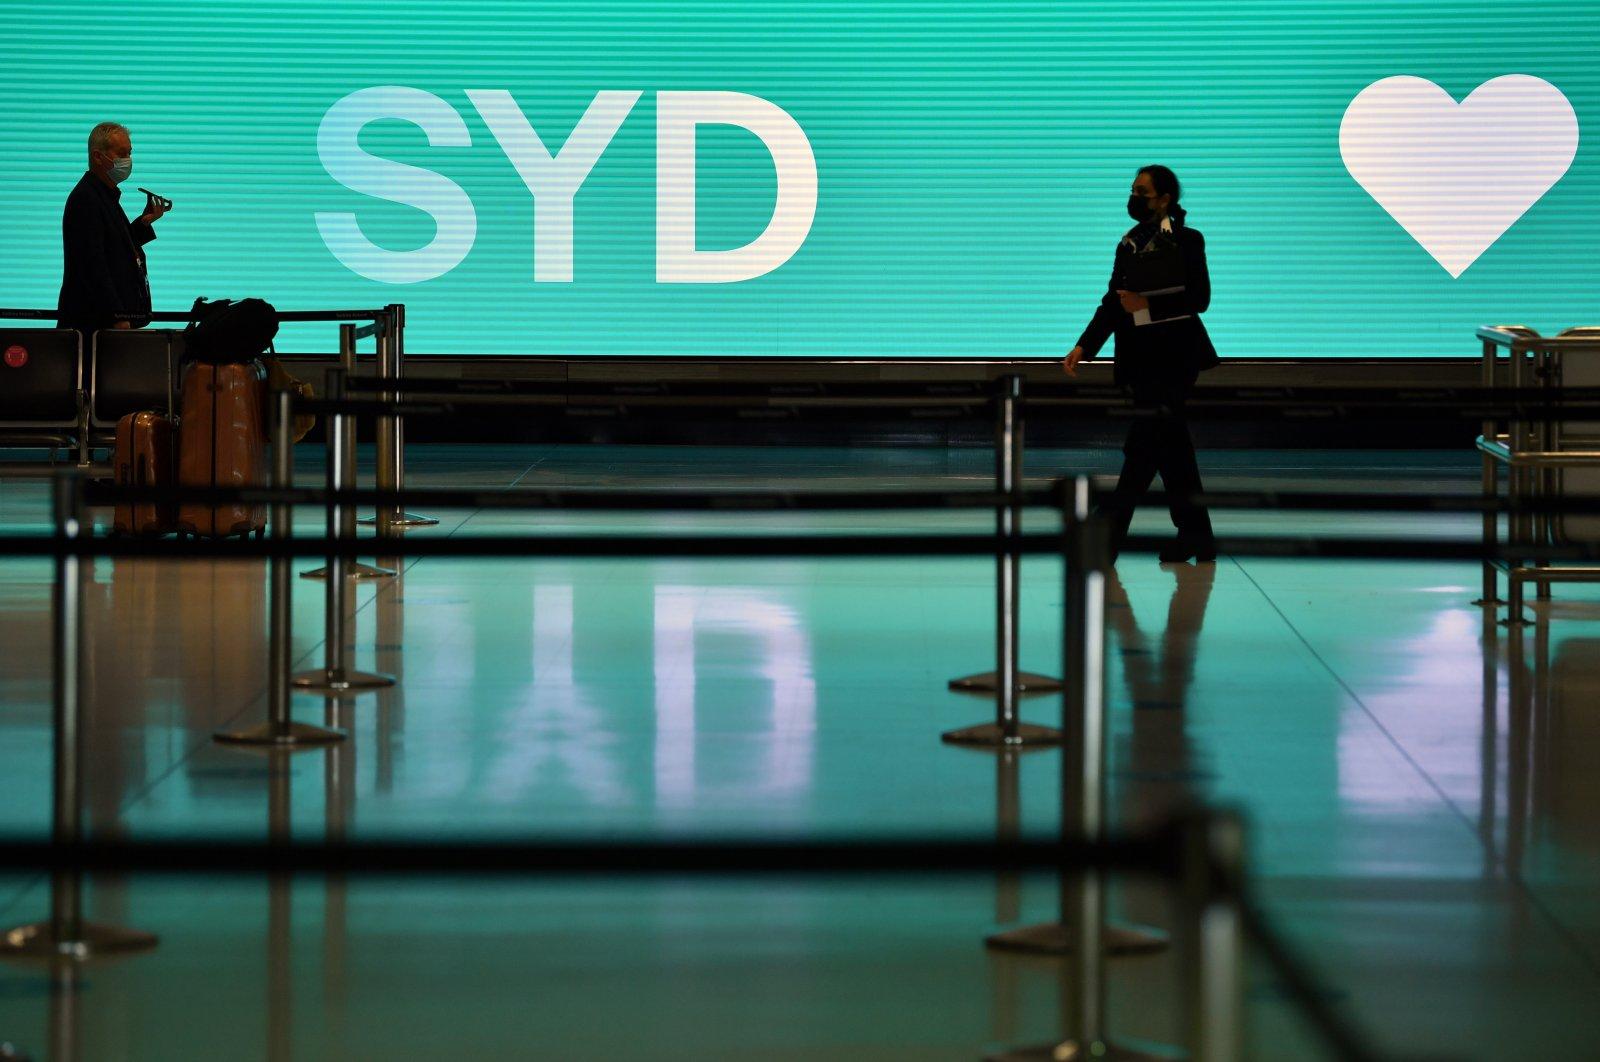 A nearly empty terminal amid the ongoing coronavirus pandemic at Sydney International Airport in Sydney, Australia, Sept. 8, 2021. (EPA Photo)